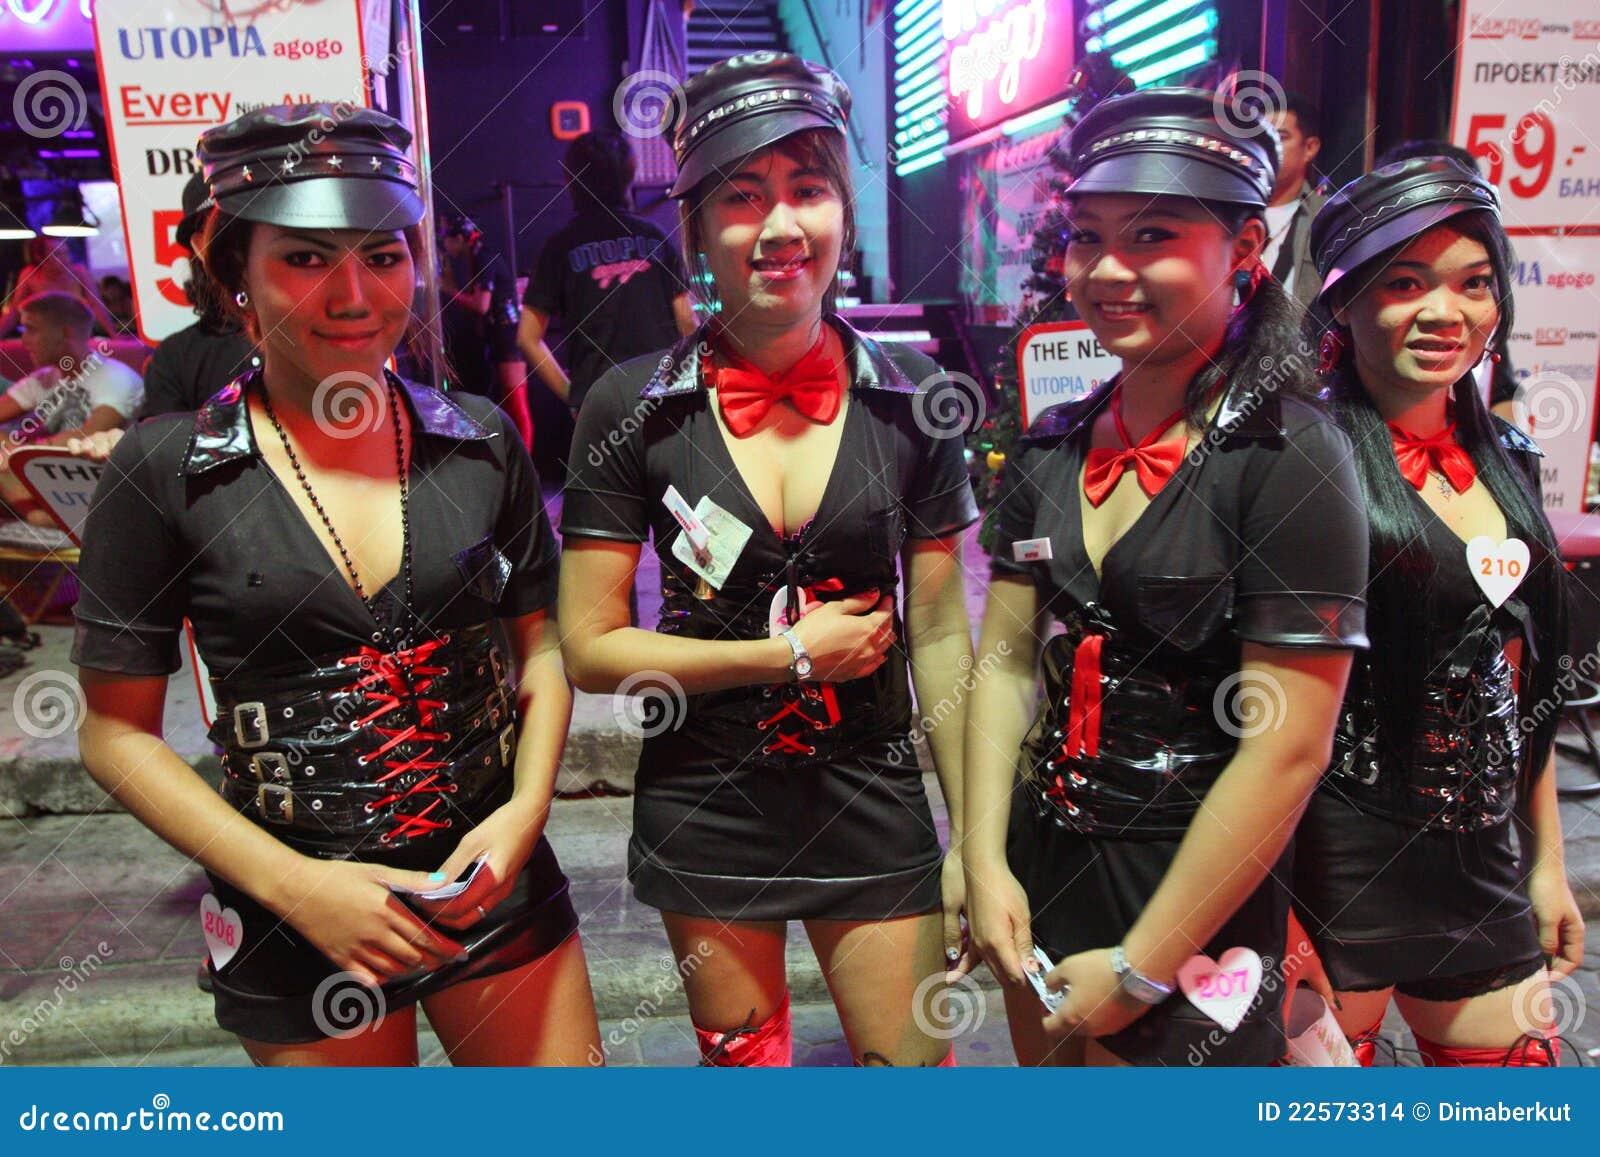 free phone sex thai bøsse escort video